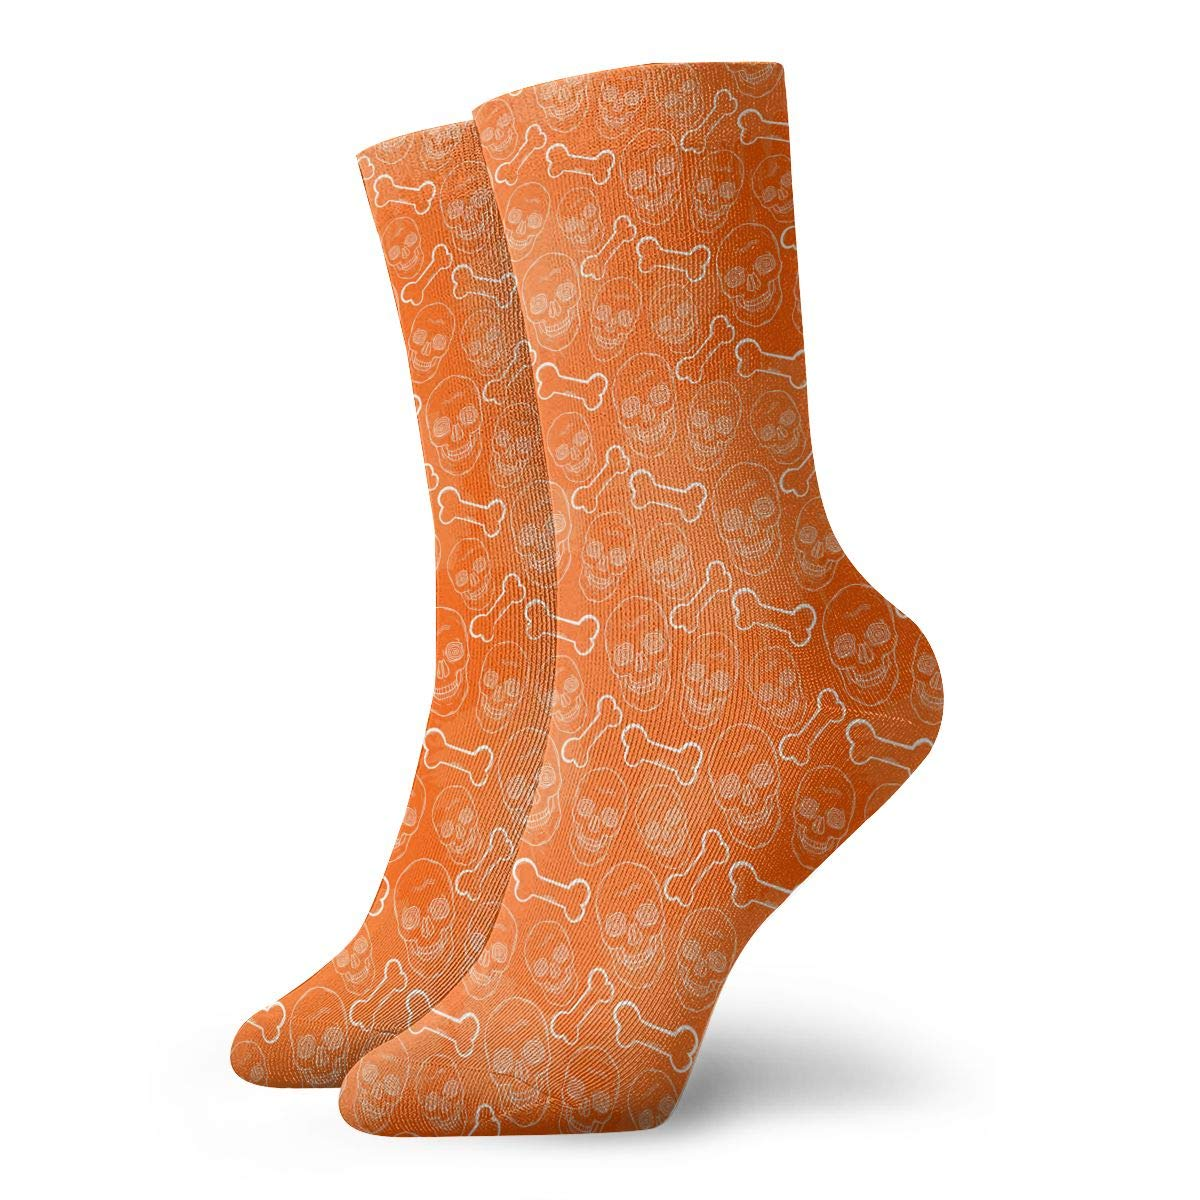 Unisex Pattern With Skull Orange Athletic Quarter Ankle Print Breathable Hiking Running Socks